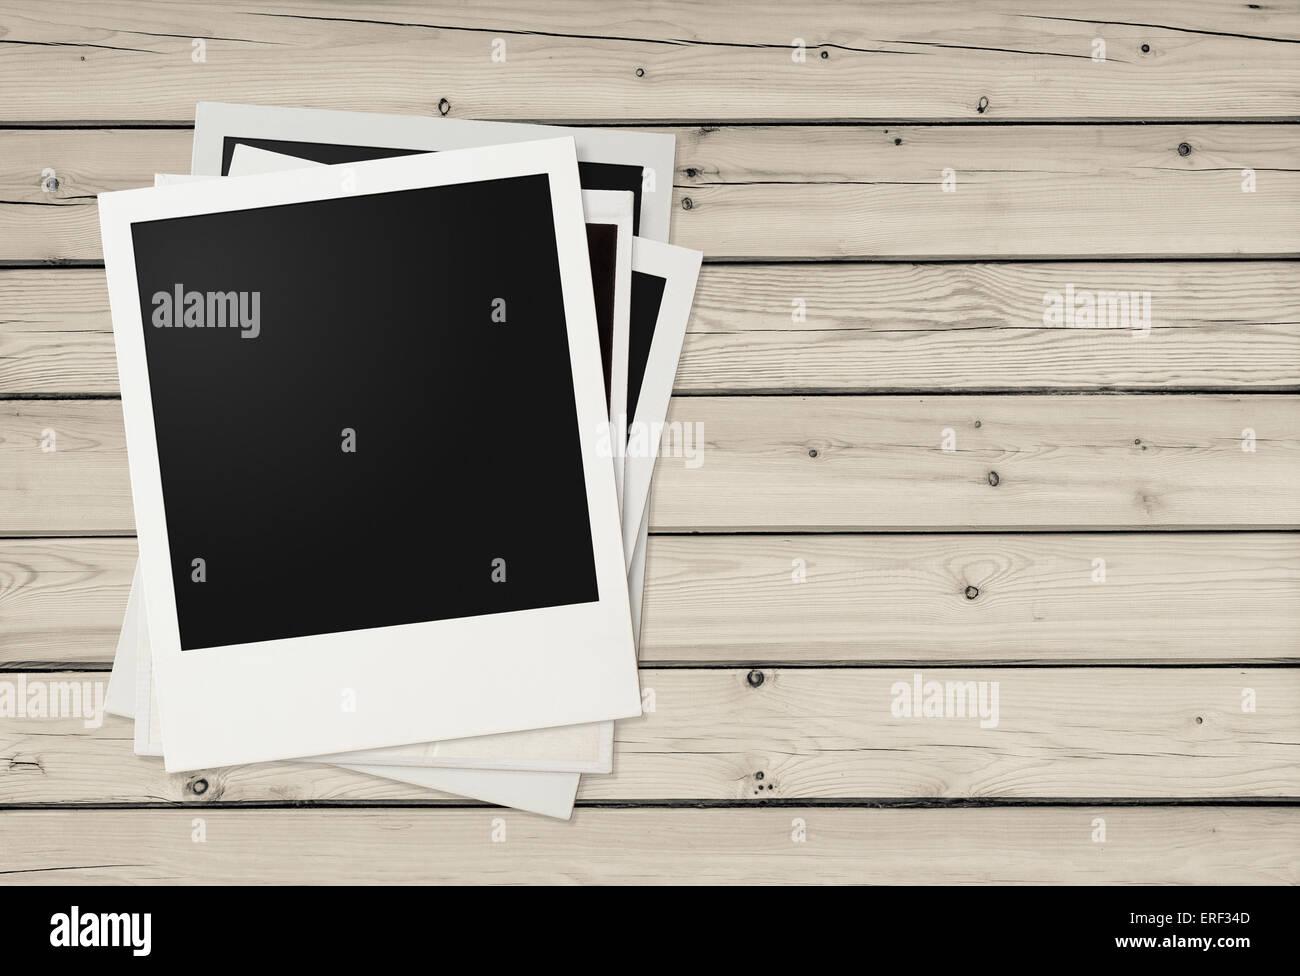 Polaroid photo frames on wooden background - Stock Image